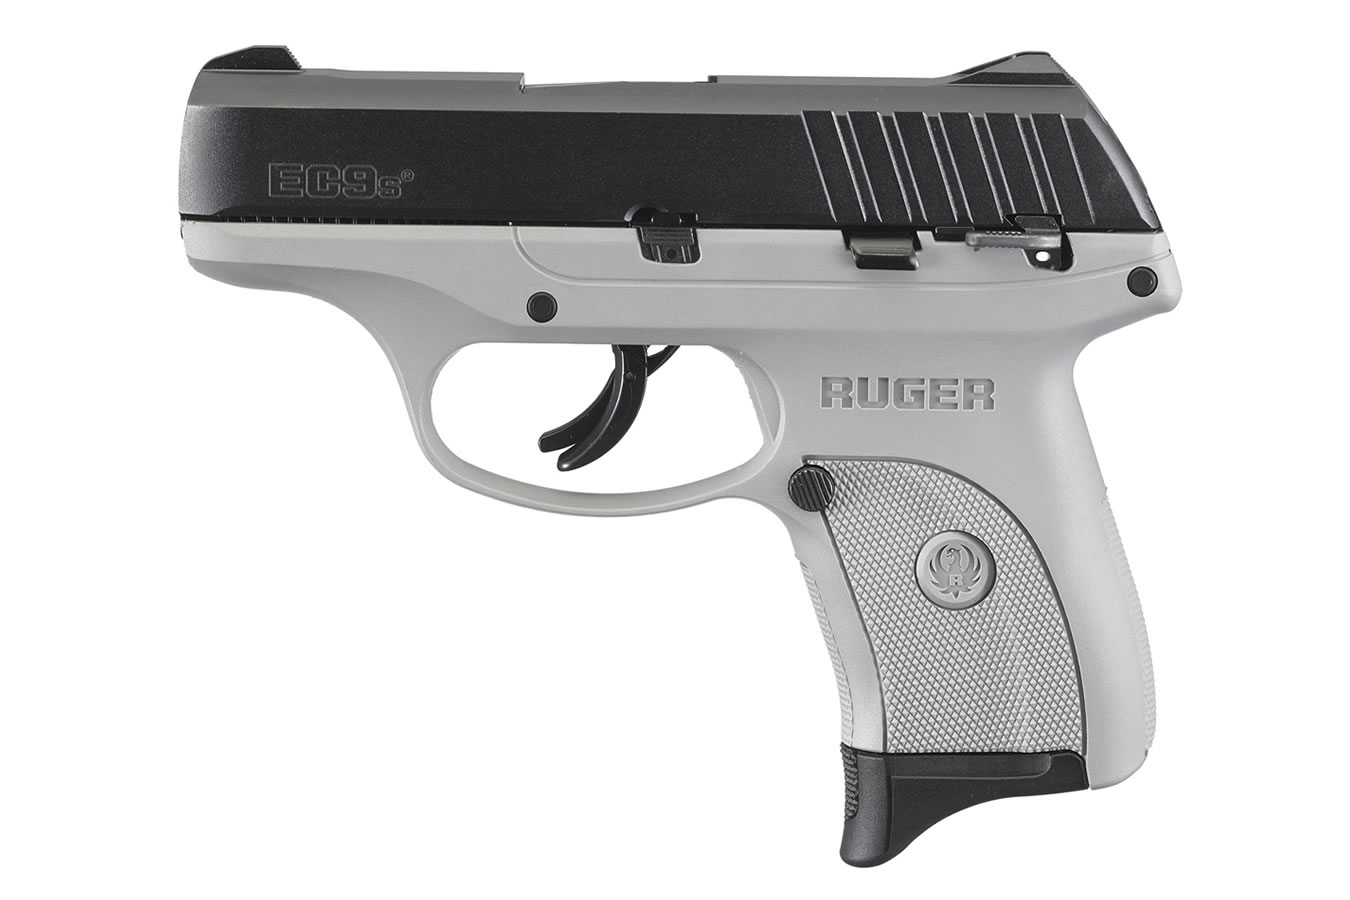 Ruger Ec9s 9mm Carry Conceal Pistol